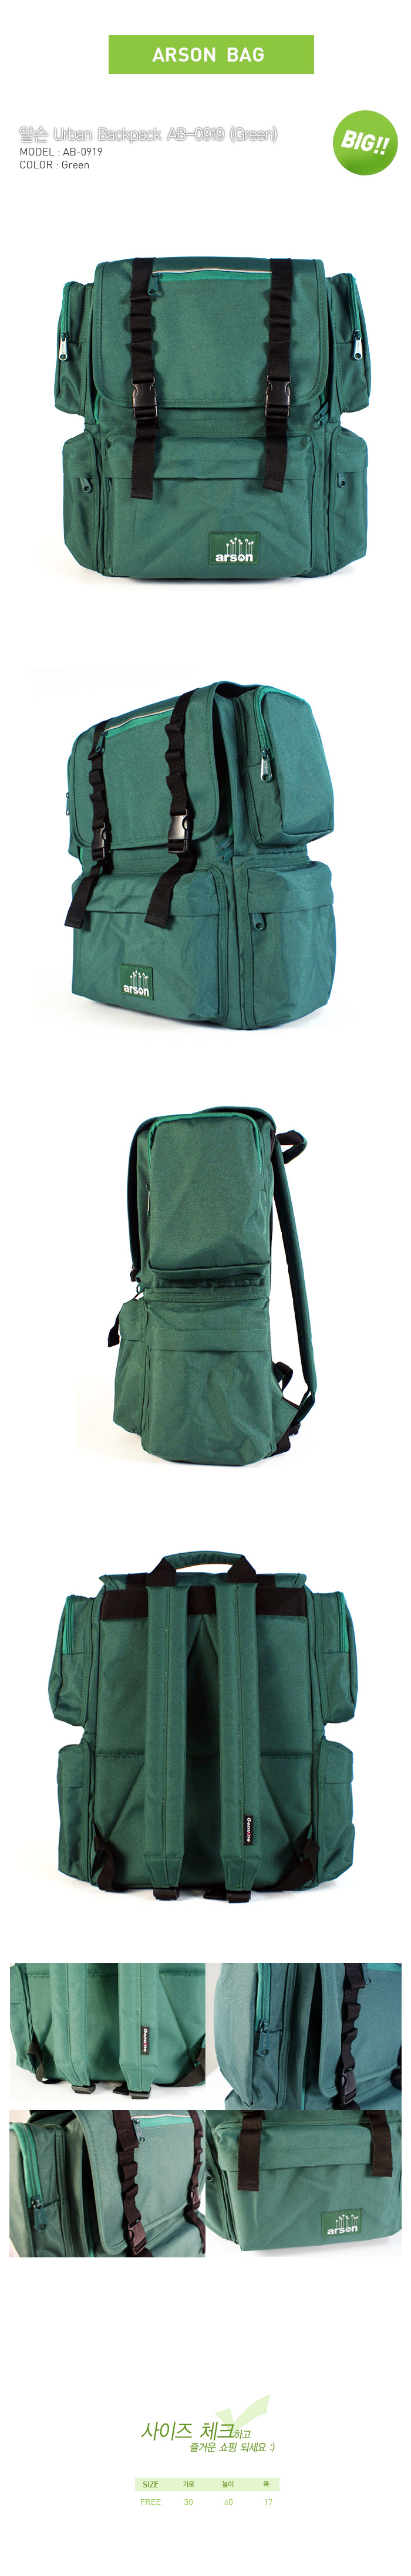 [ ARSON ] AB-0919(绿色)背包书包